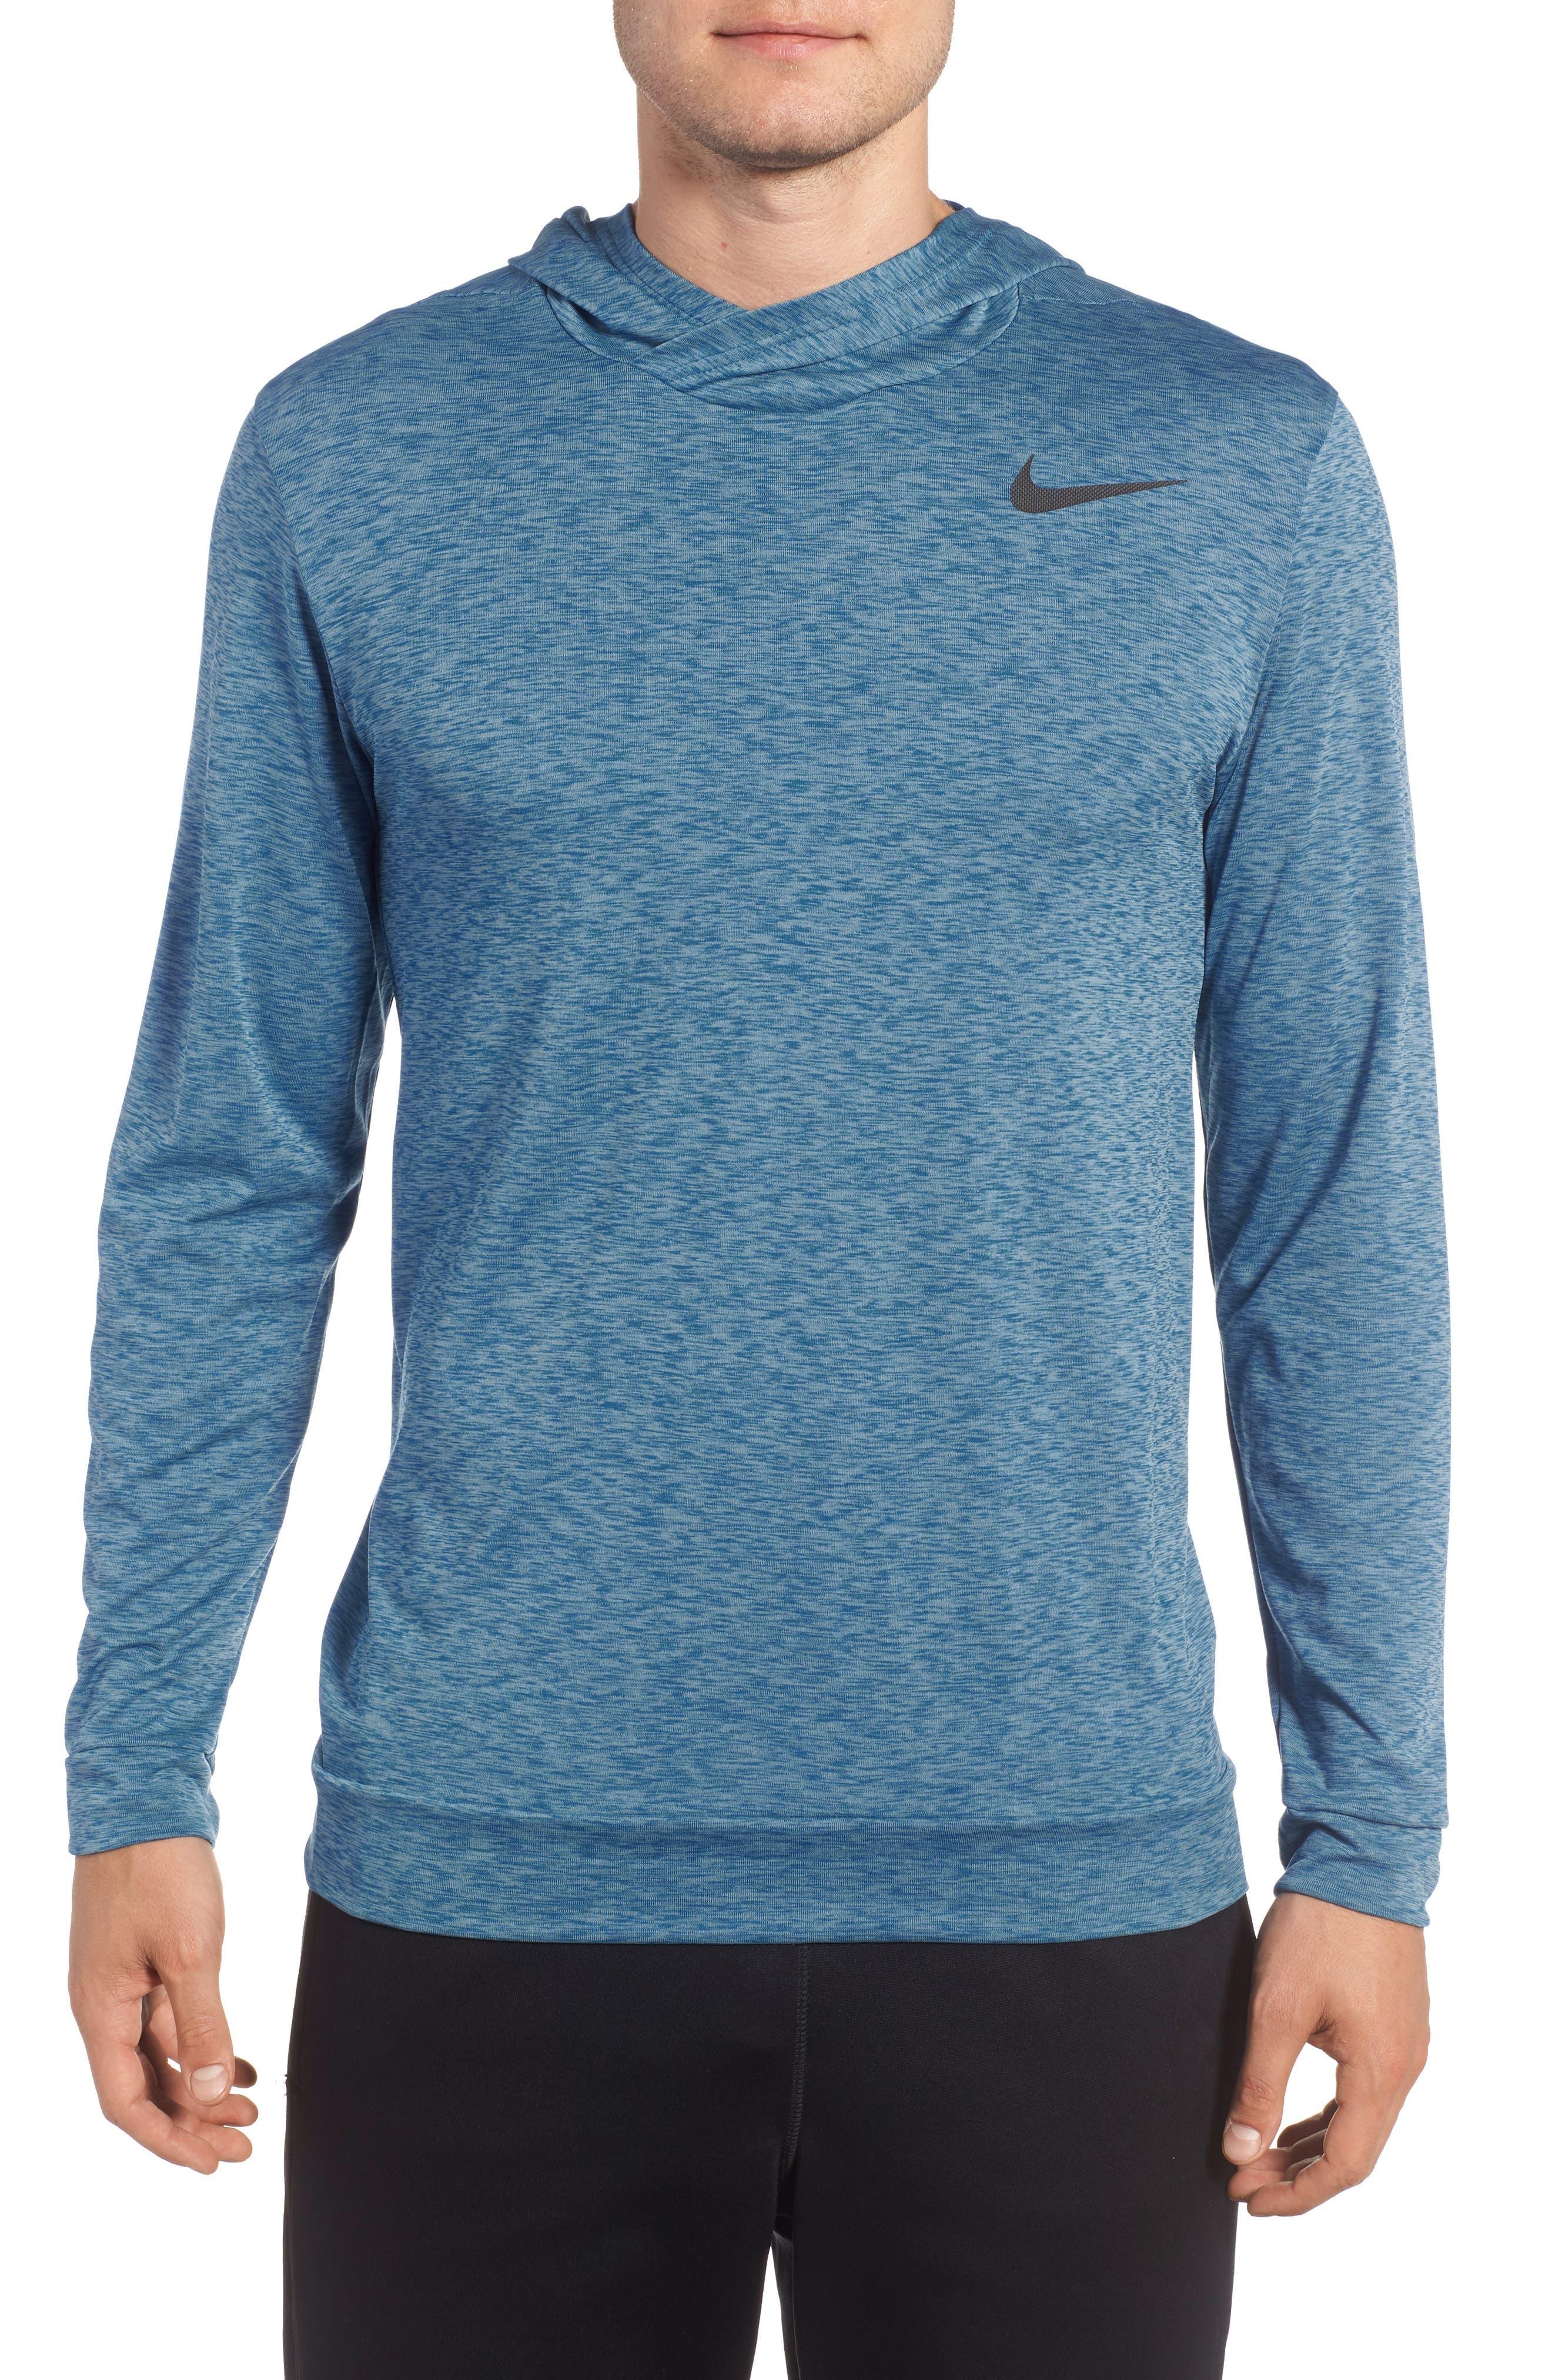 Hyper Dry Regular Fit Training Hoodie,                         Main,                         color, Cerulean/ Blue Jay/ Black